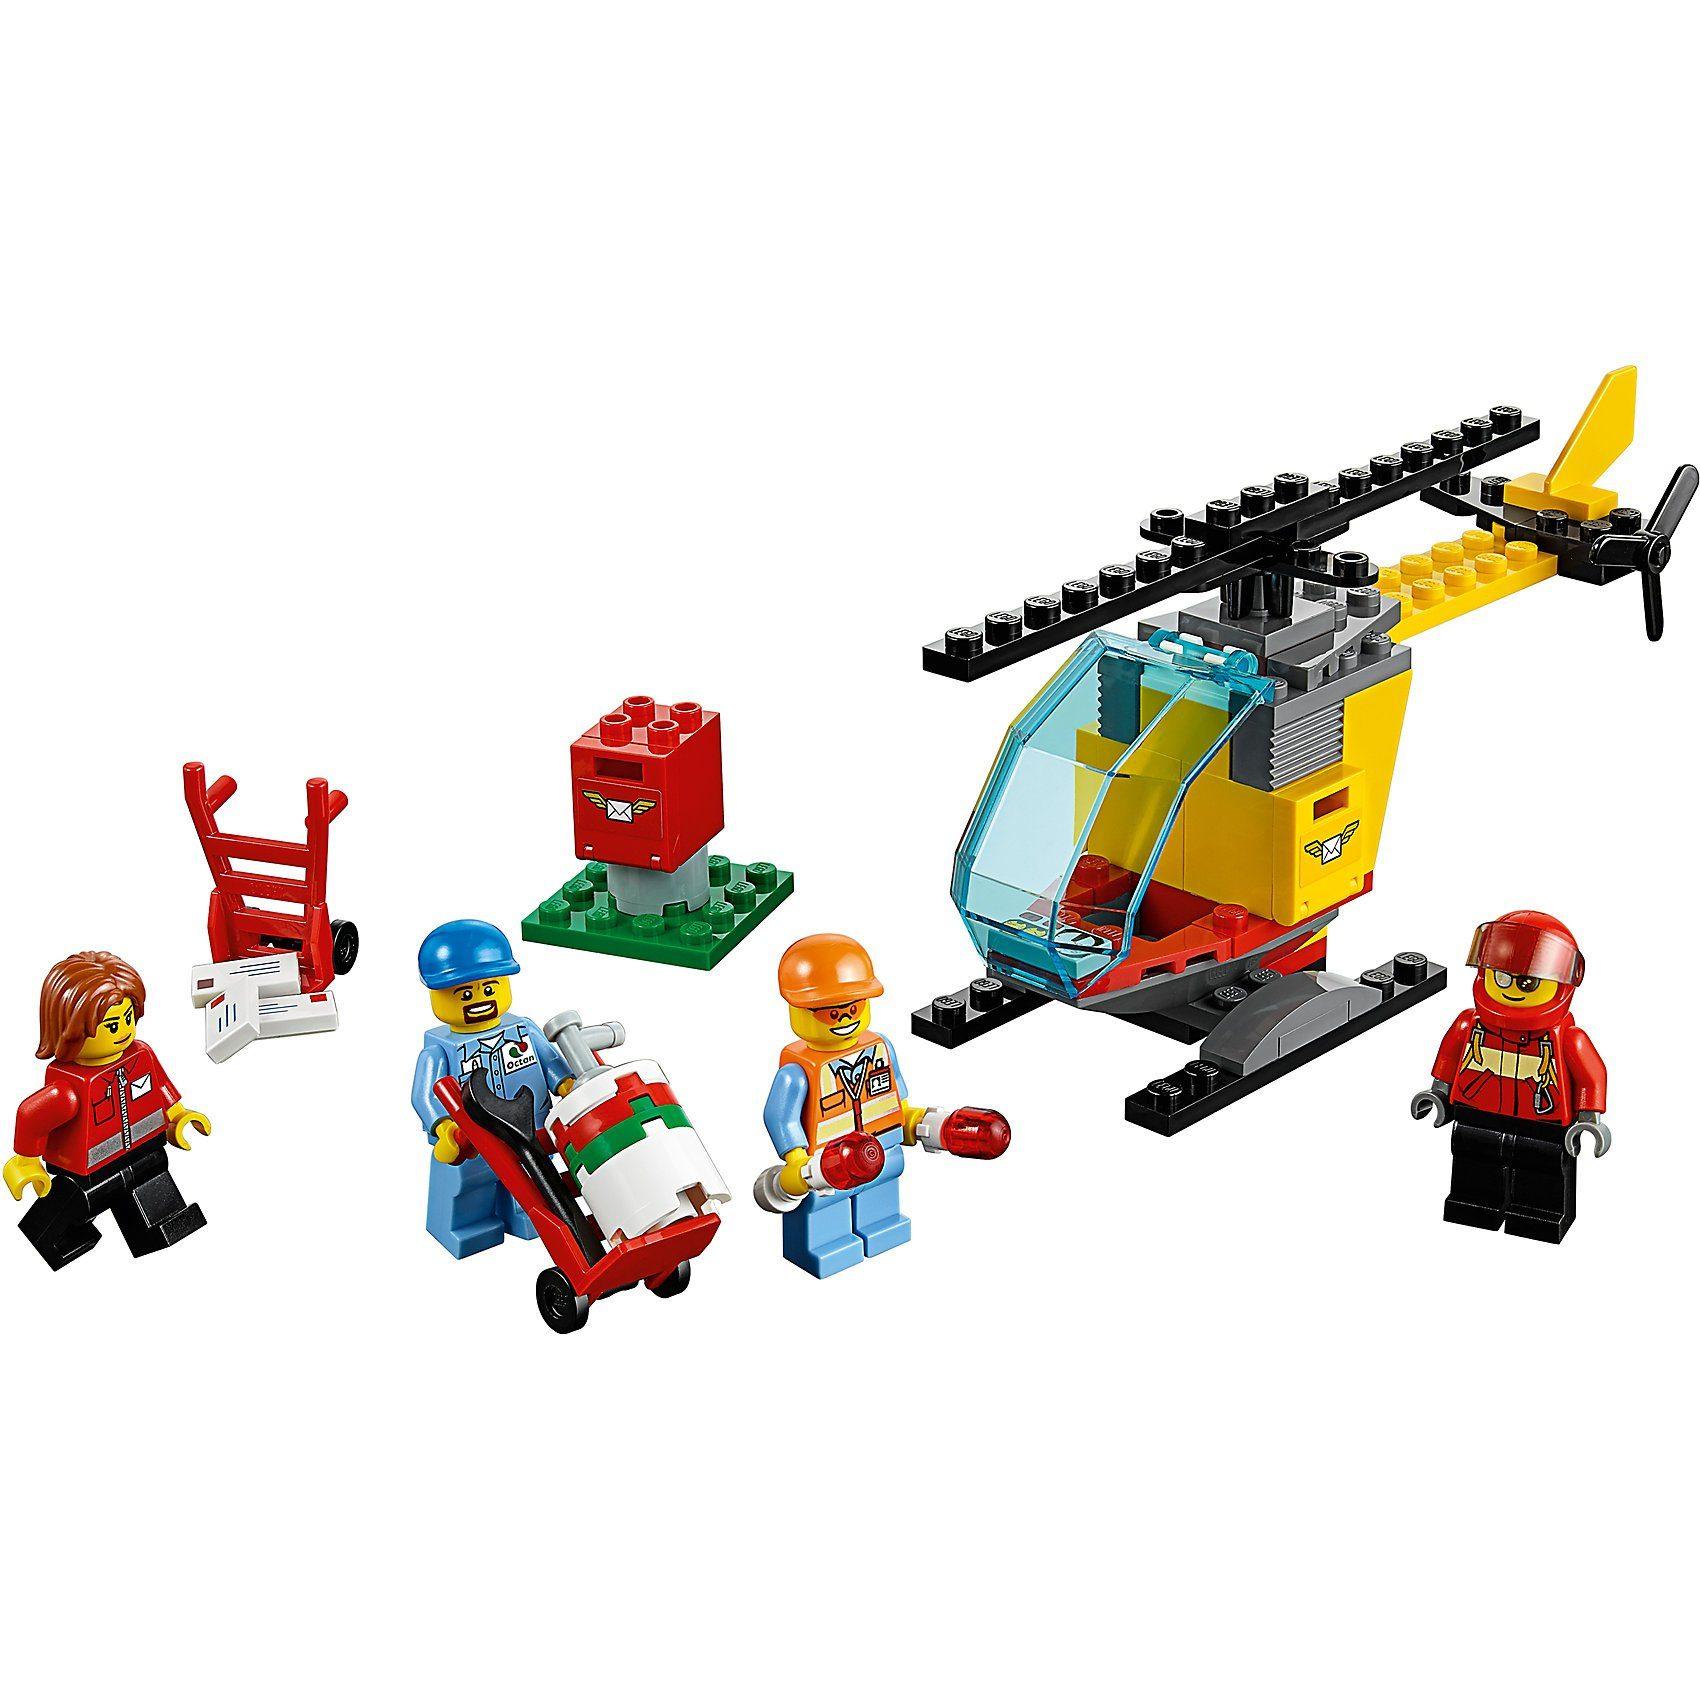 60100 City: Flughafen Starter-Set